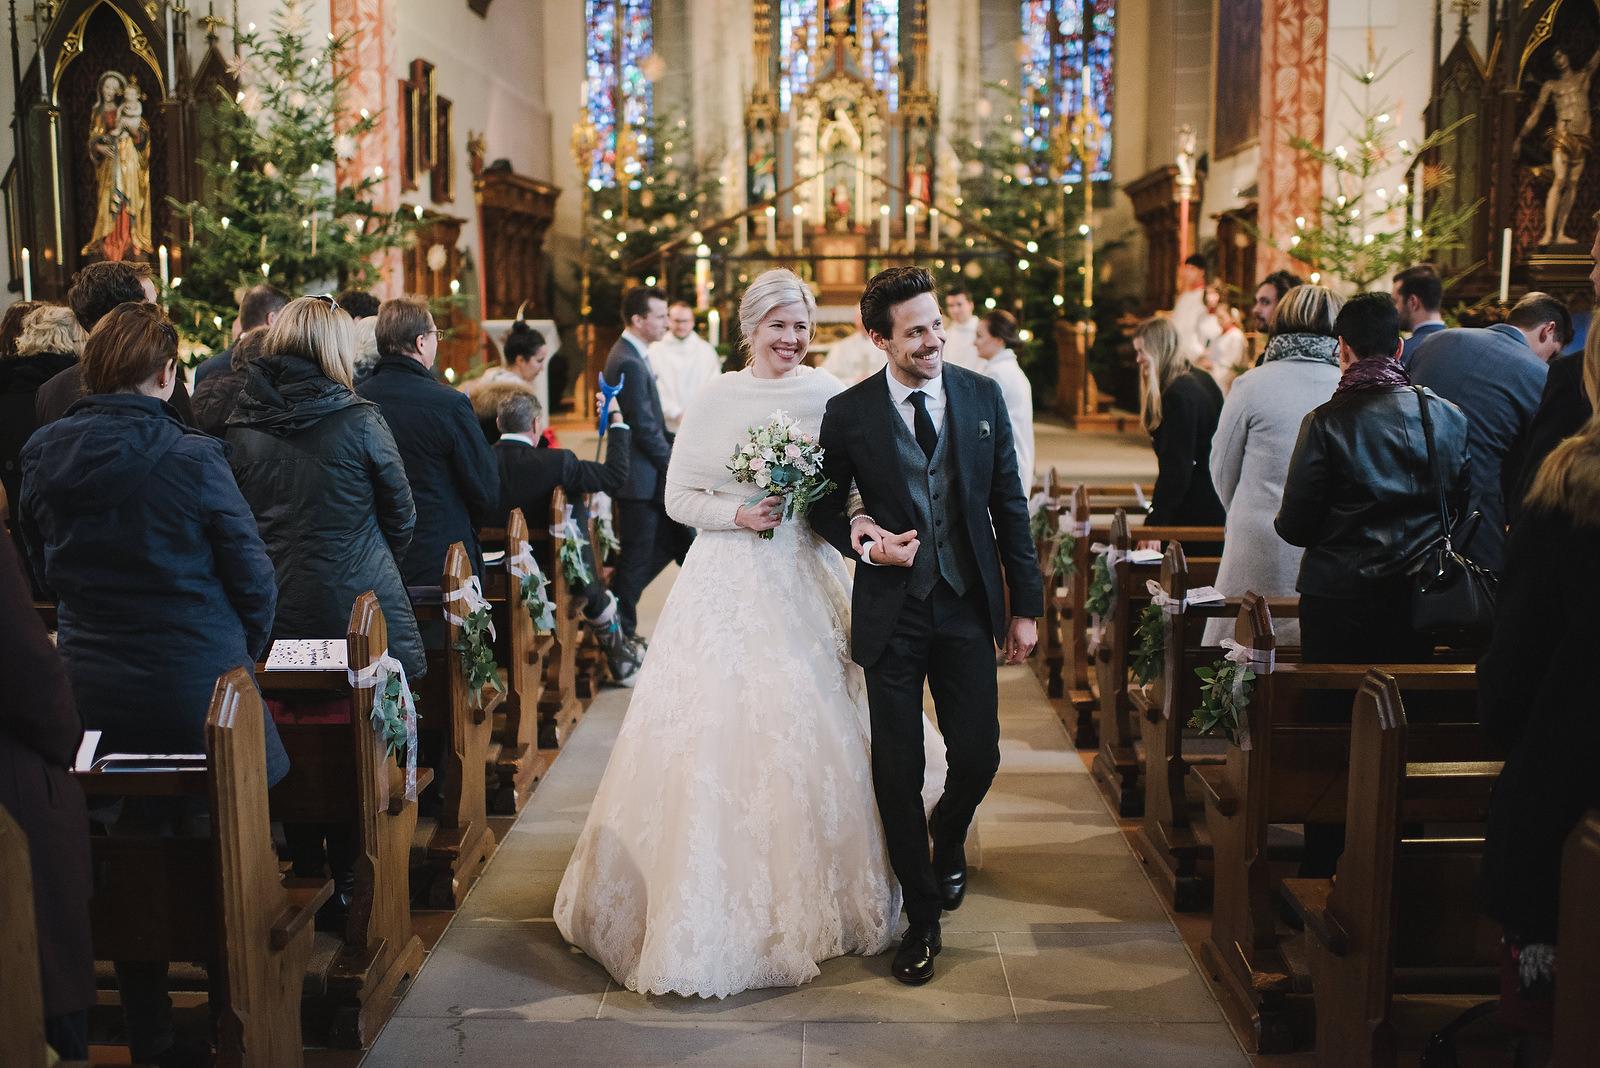 Fotograf Konstanz - Silvester Wedding in Hagnau / Friedrichshafen at Lake of Constance  - 21 -